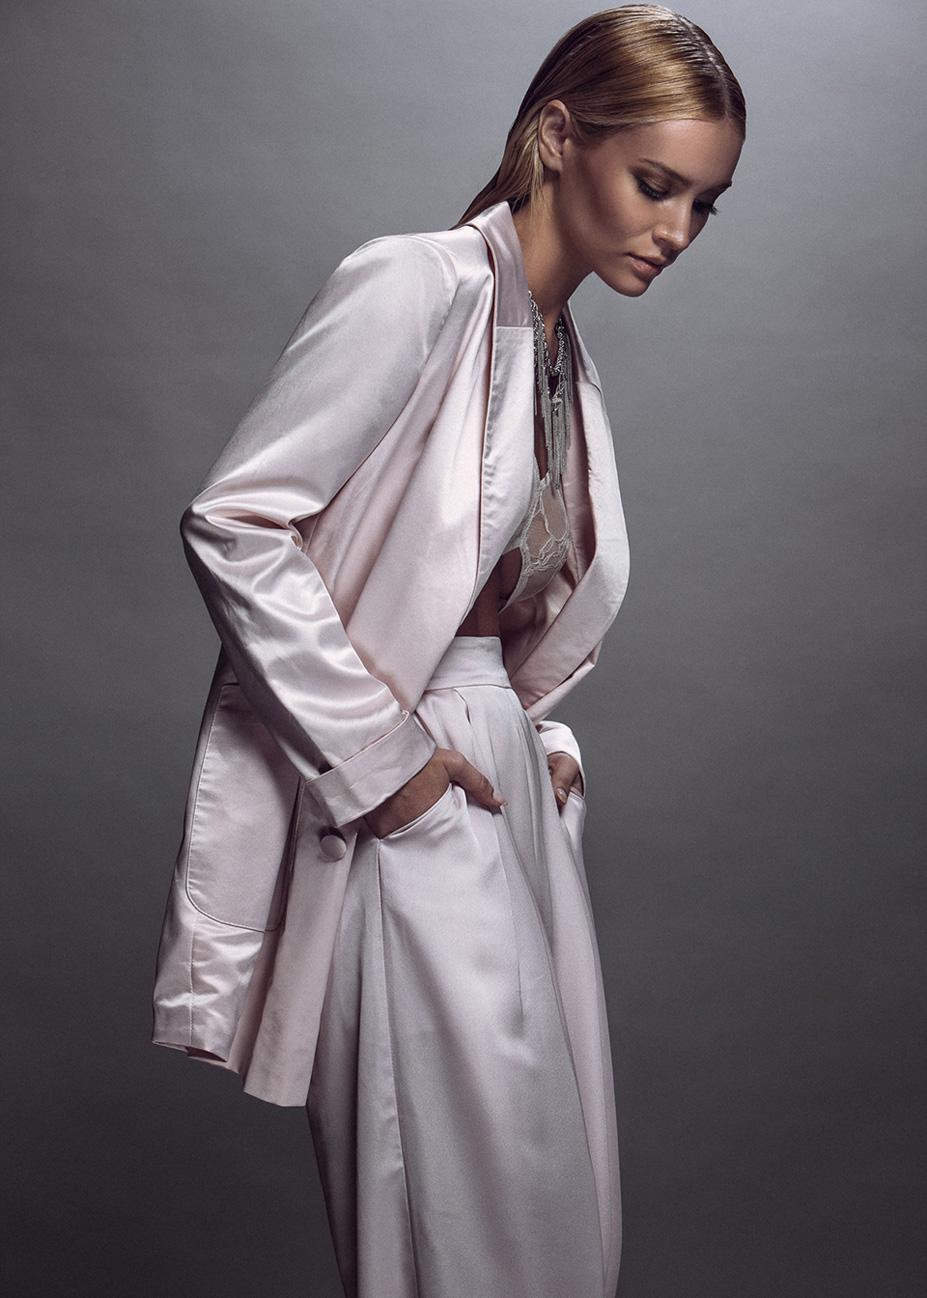 Воин Брайана Холли / Bryana Holly by Ben Tsui - Yume Magazine